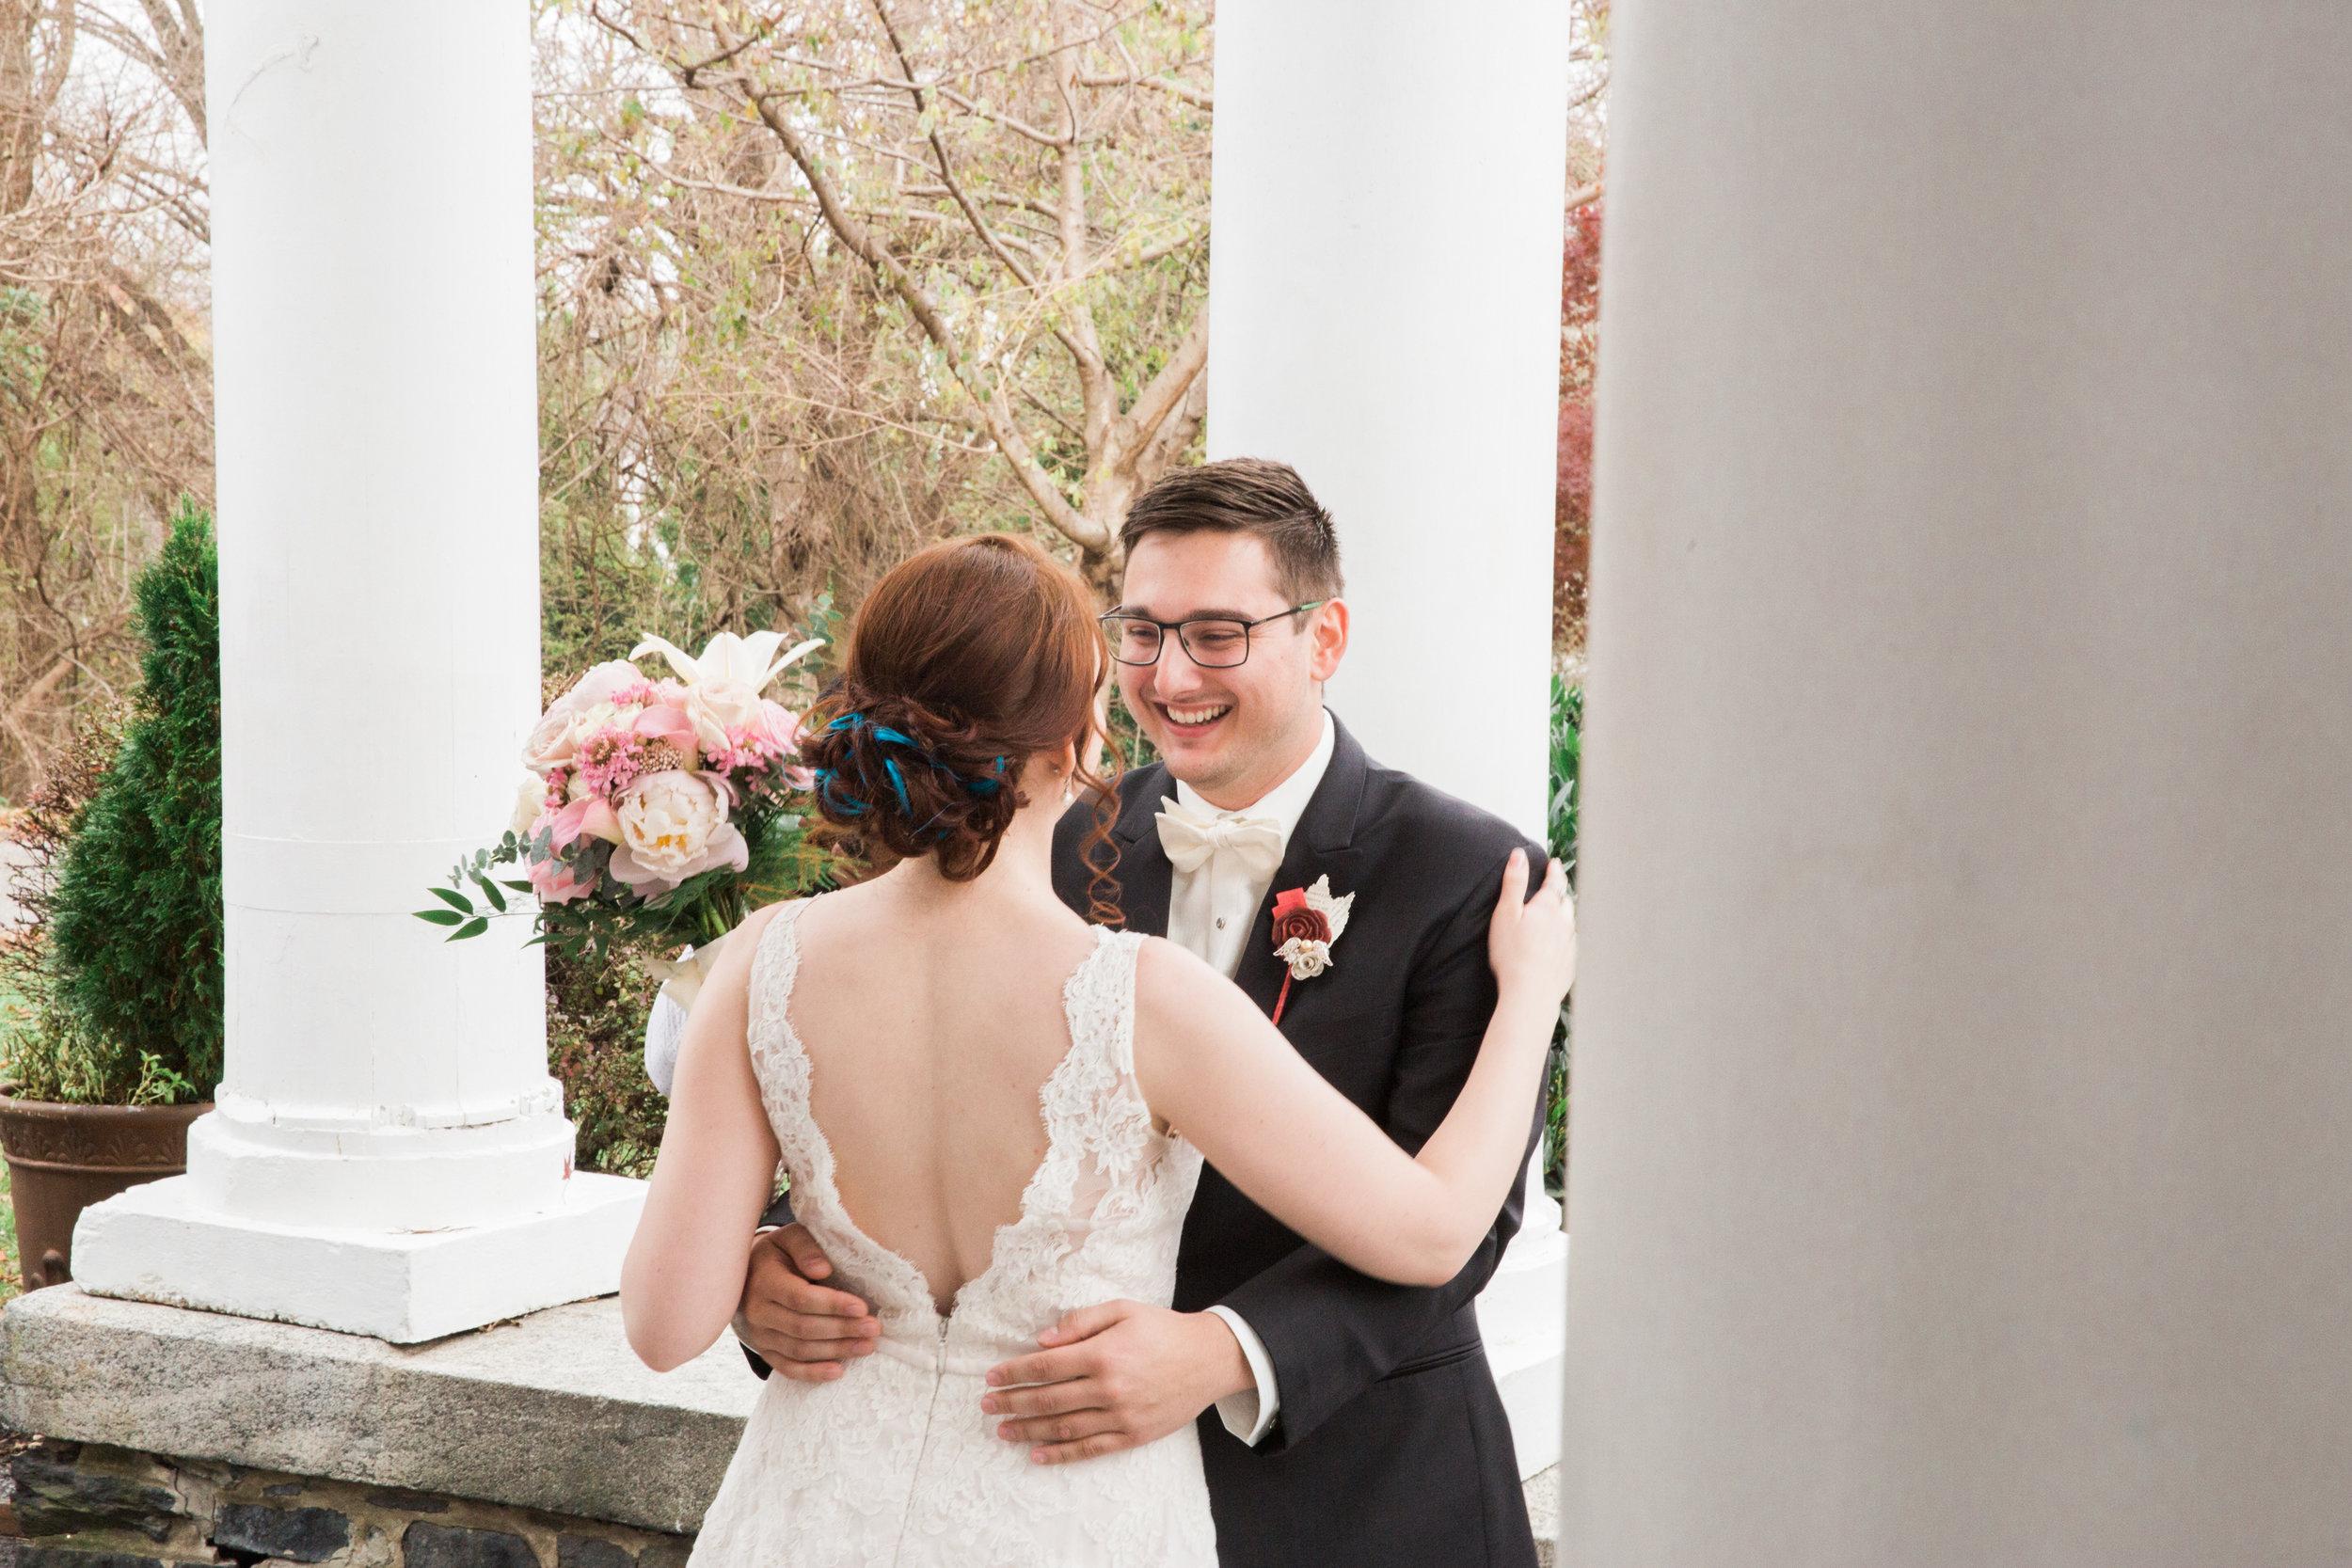 Harry Potter Wedding at Overhills Mansion Catonville Maryland Wedding Photographers Megapixels Media (35 of 134).jpg